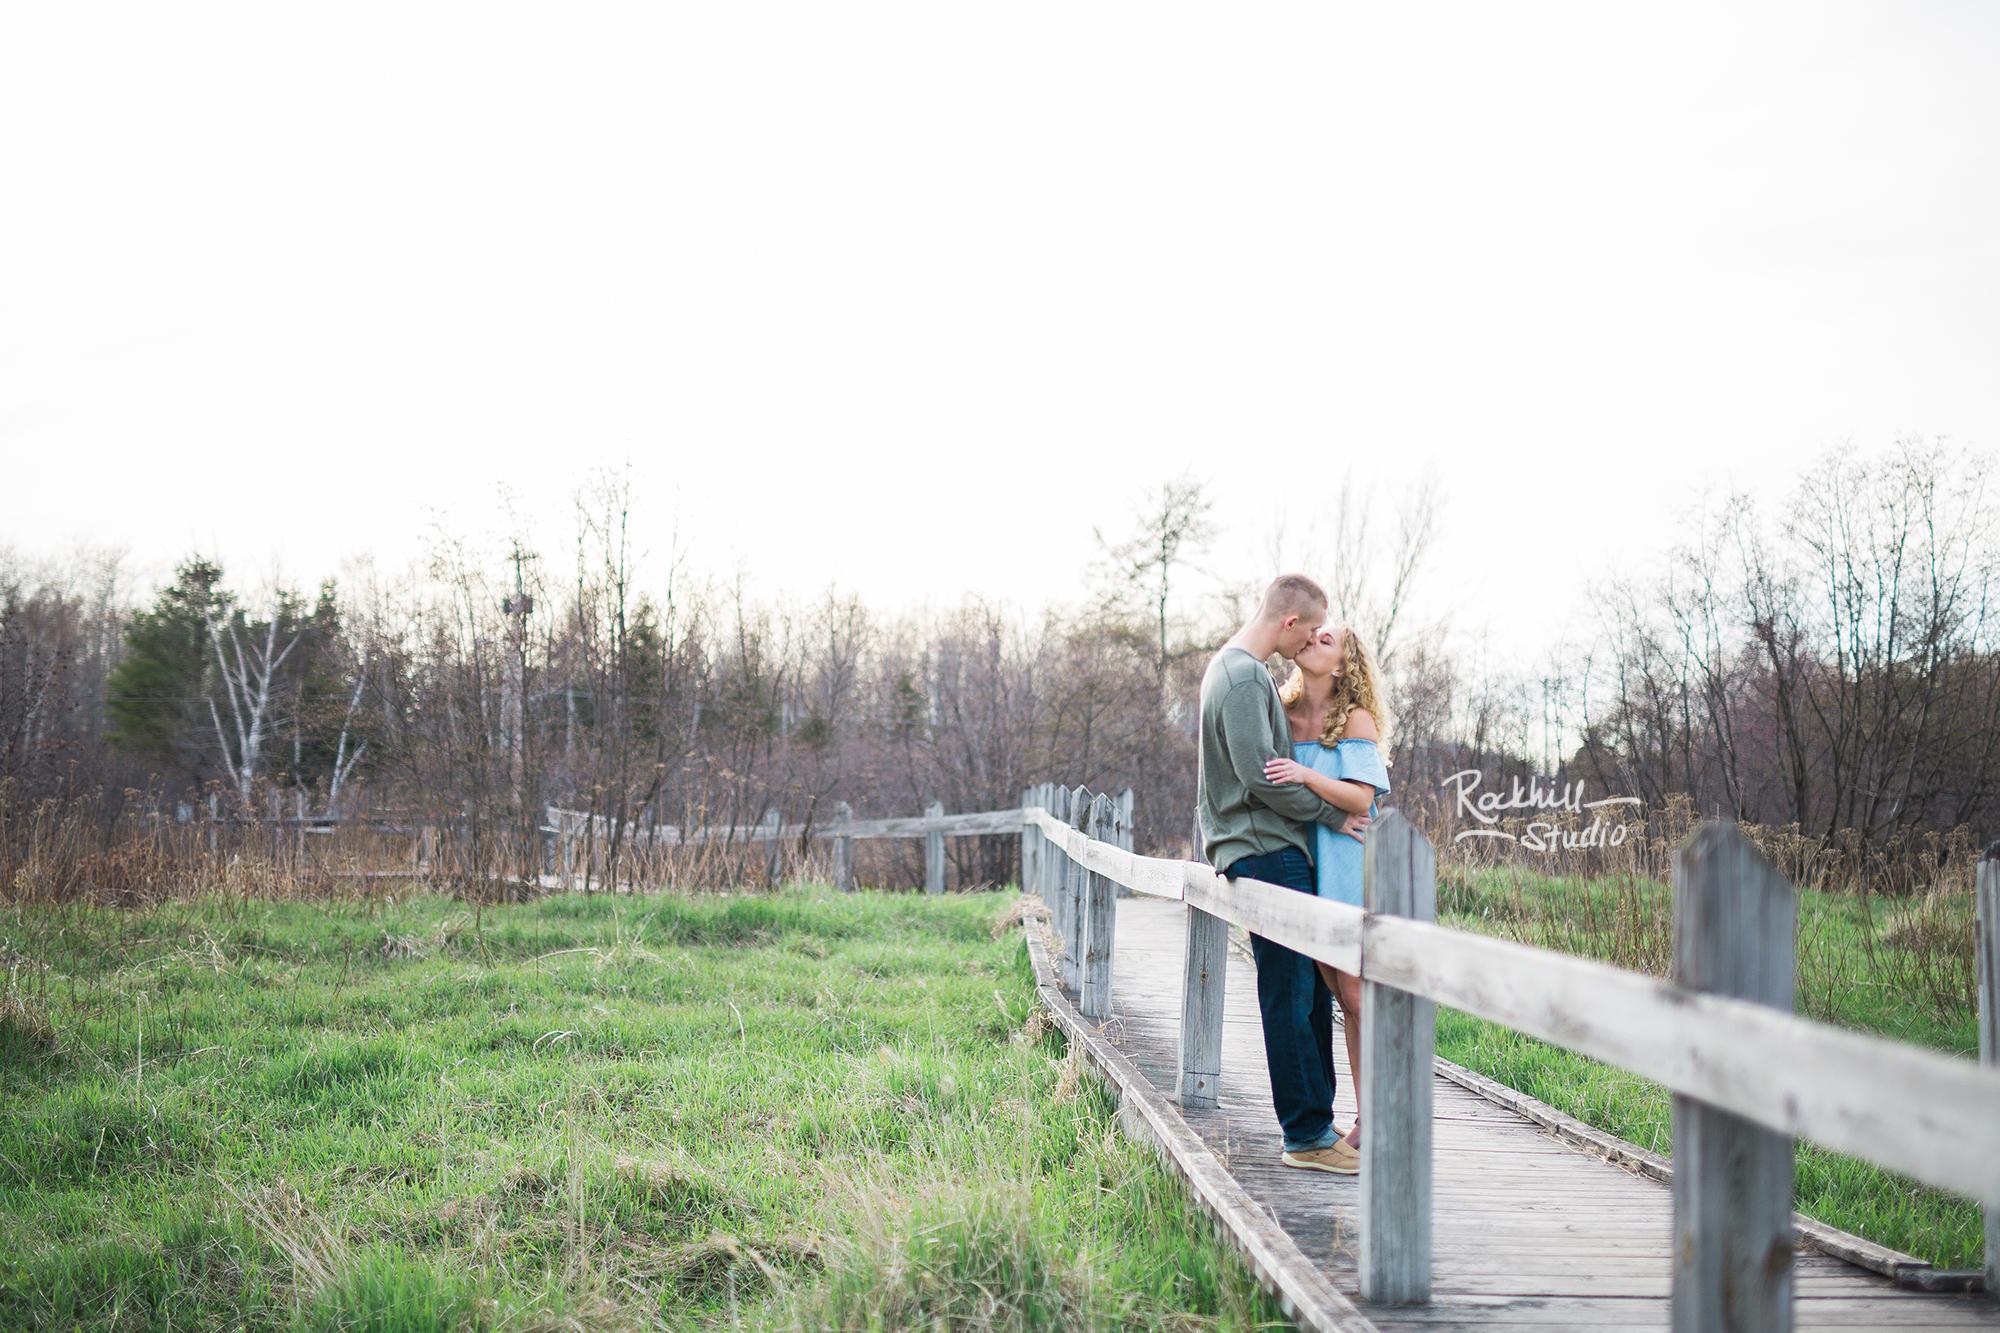 marquette-michigan-wedding-photography-rockhill-presque-isle-upper-peninsula-michigan-haley-8.jpg